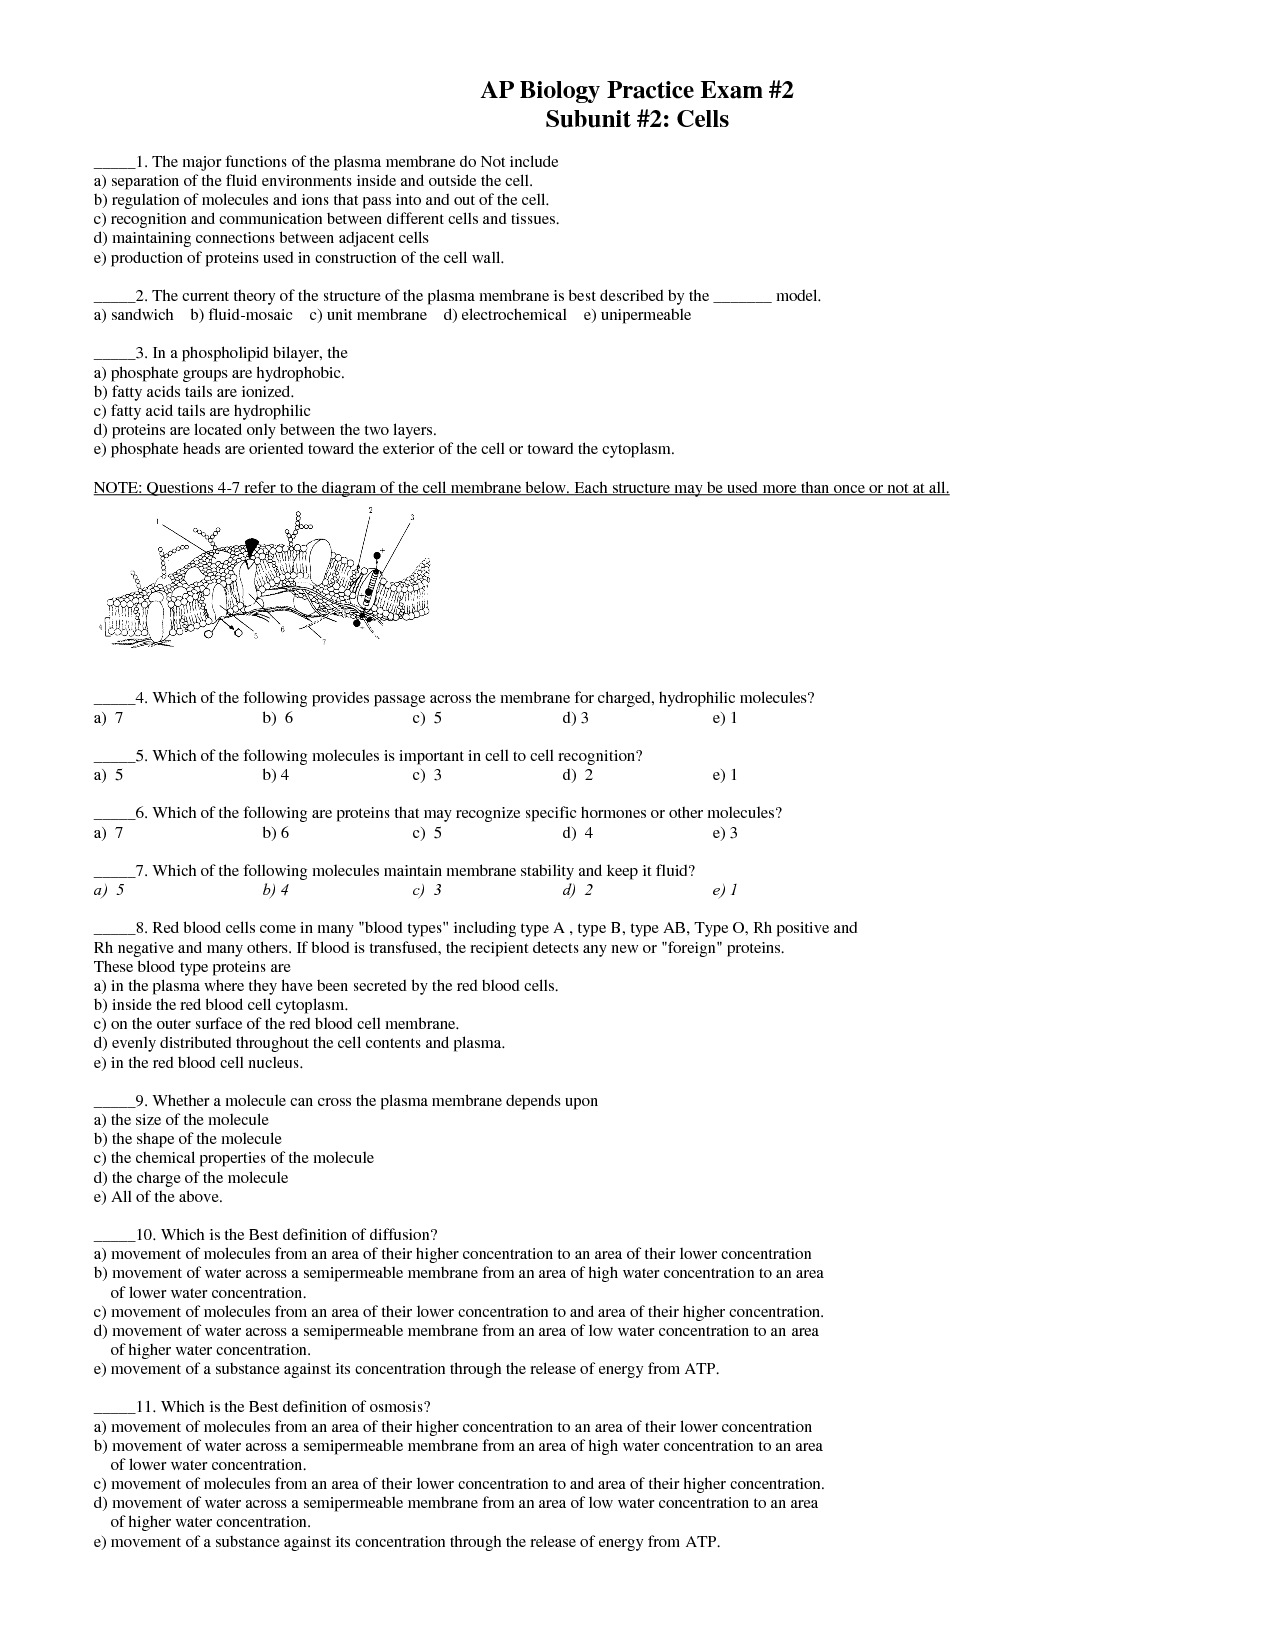 Ap biology test essay questions - antitesisadalah.x.fc2.com